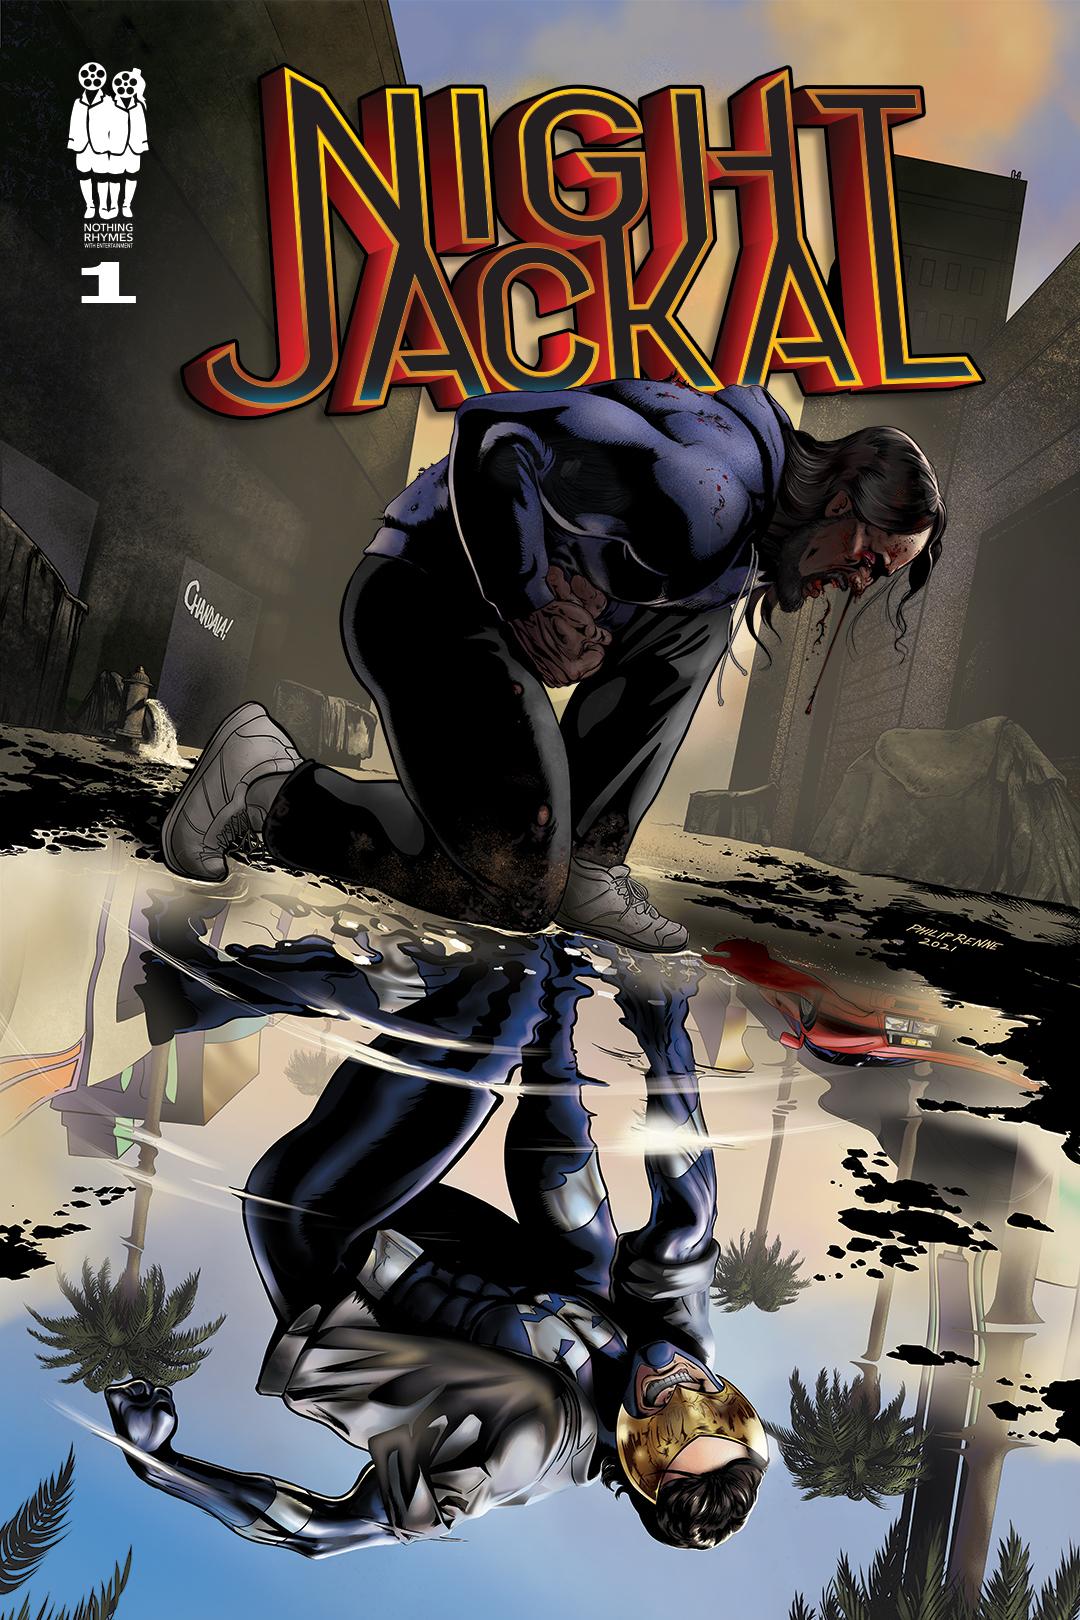 Night Jackal